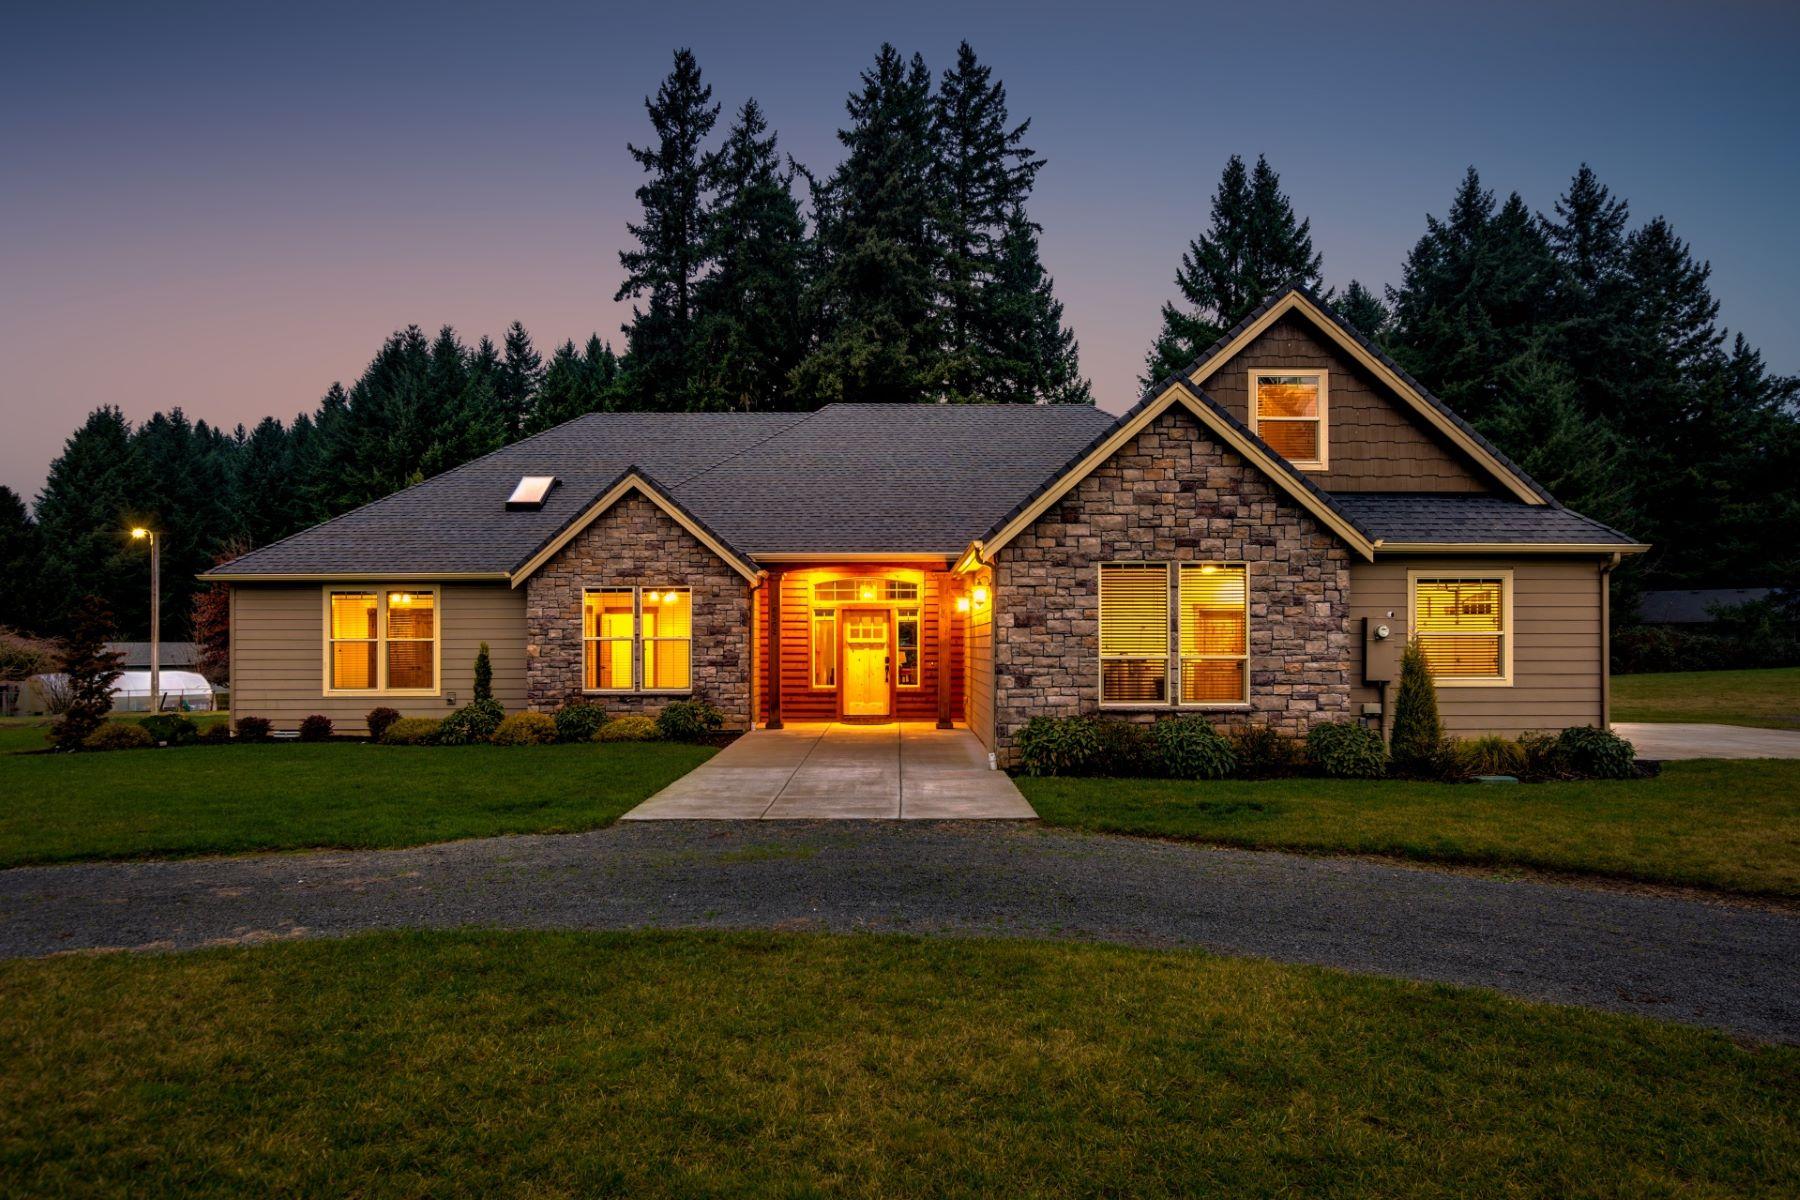 Single Family Homes for Sale at Craftsman Style Luxury on 2.5 Acres 6502 NE 124th St Vancouver, Washington 98686 United States